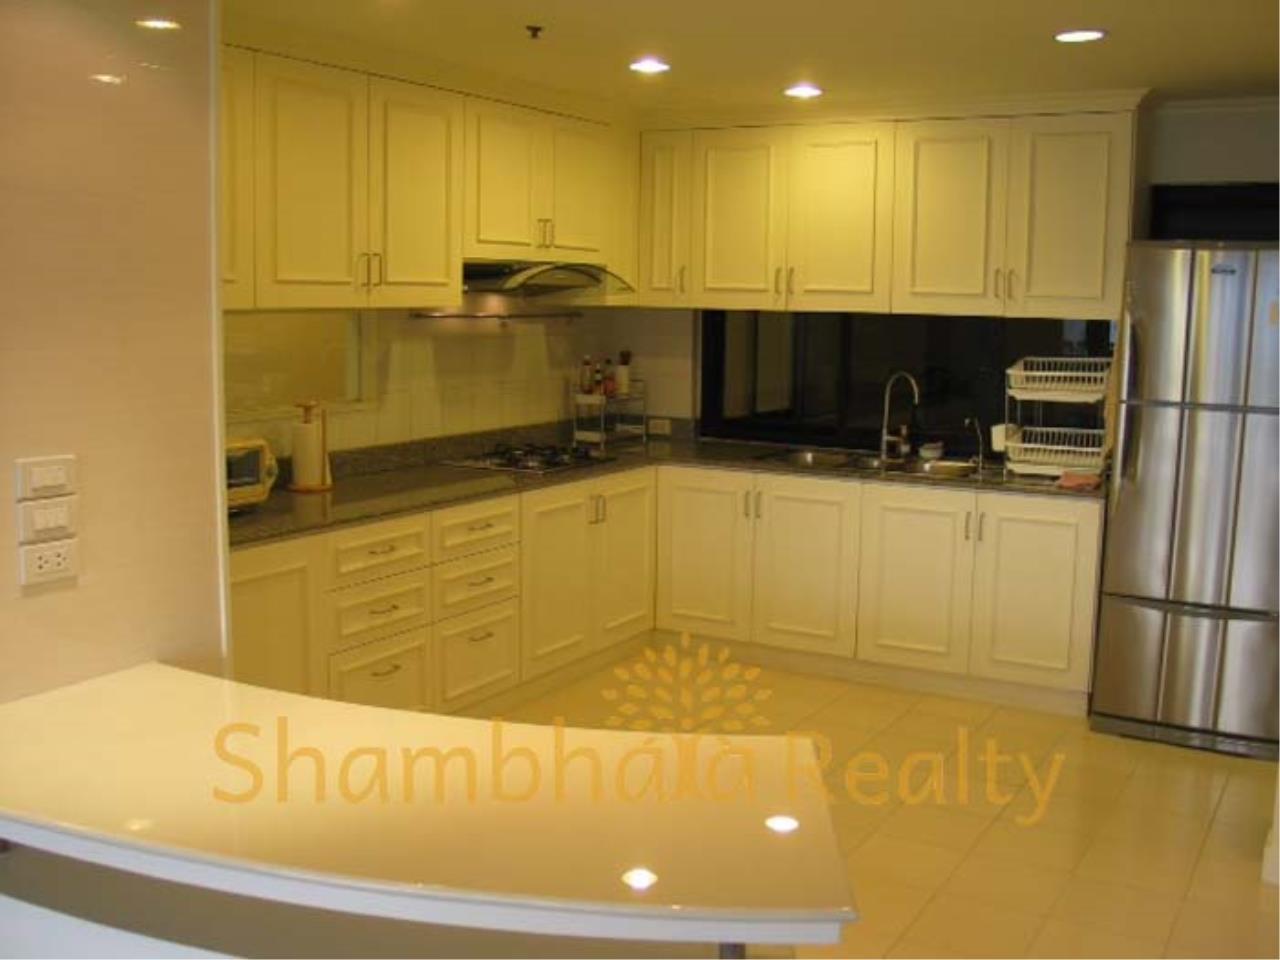 Shambhala Realty Agency's Kiat Thani Condominium for Sale in sukhumvit 31 10